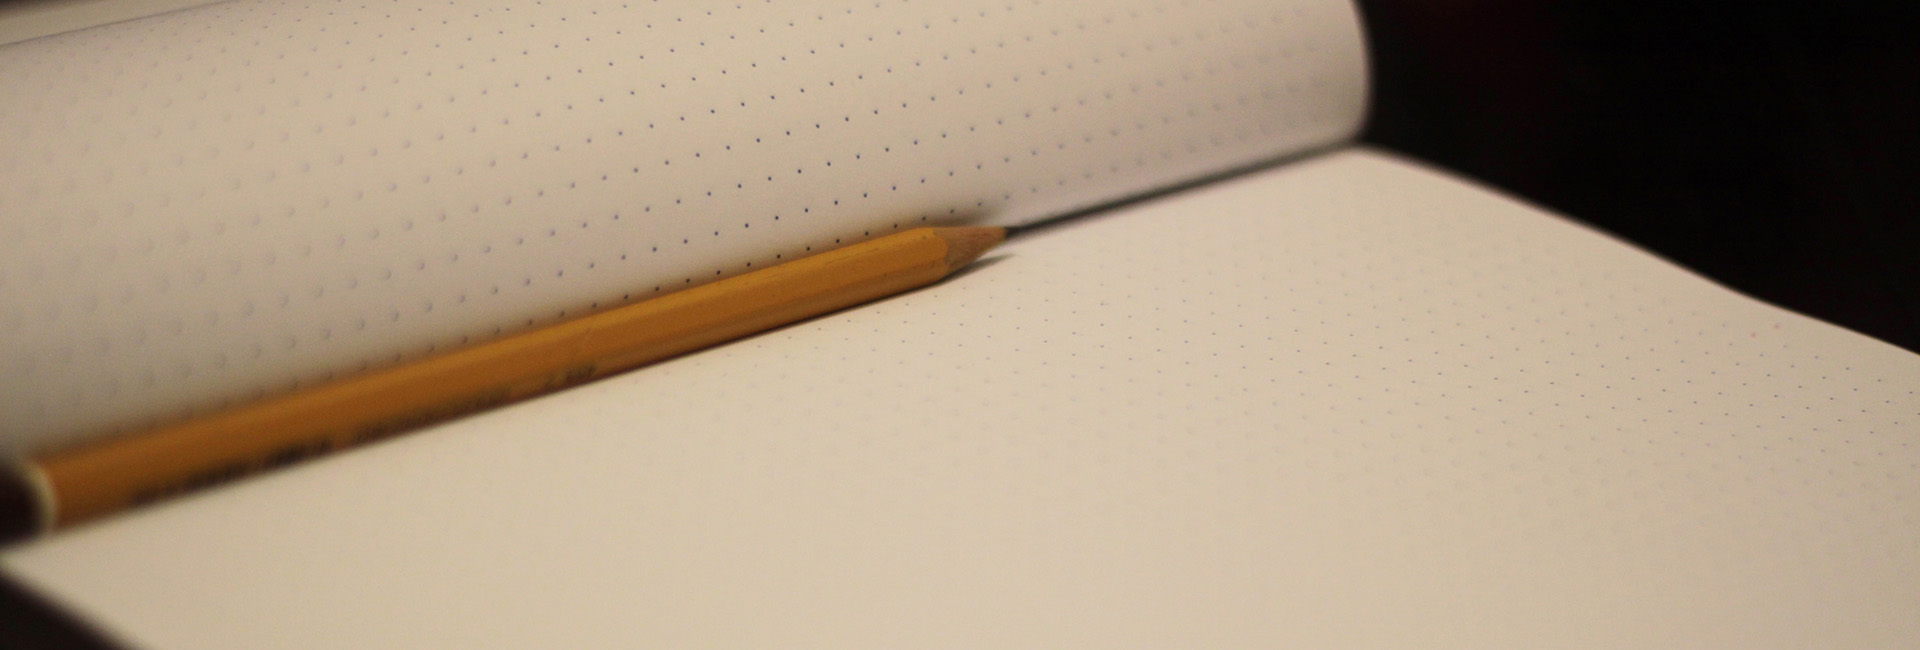 notepad-925996